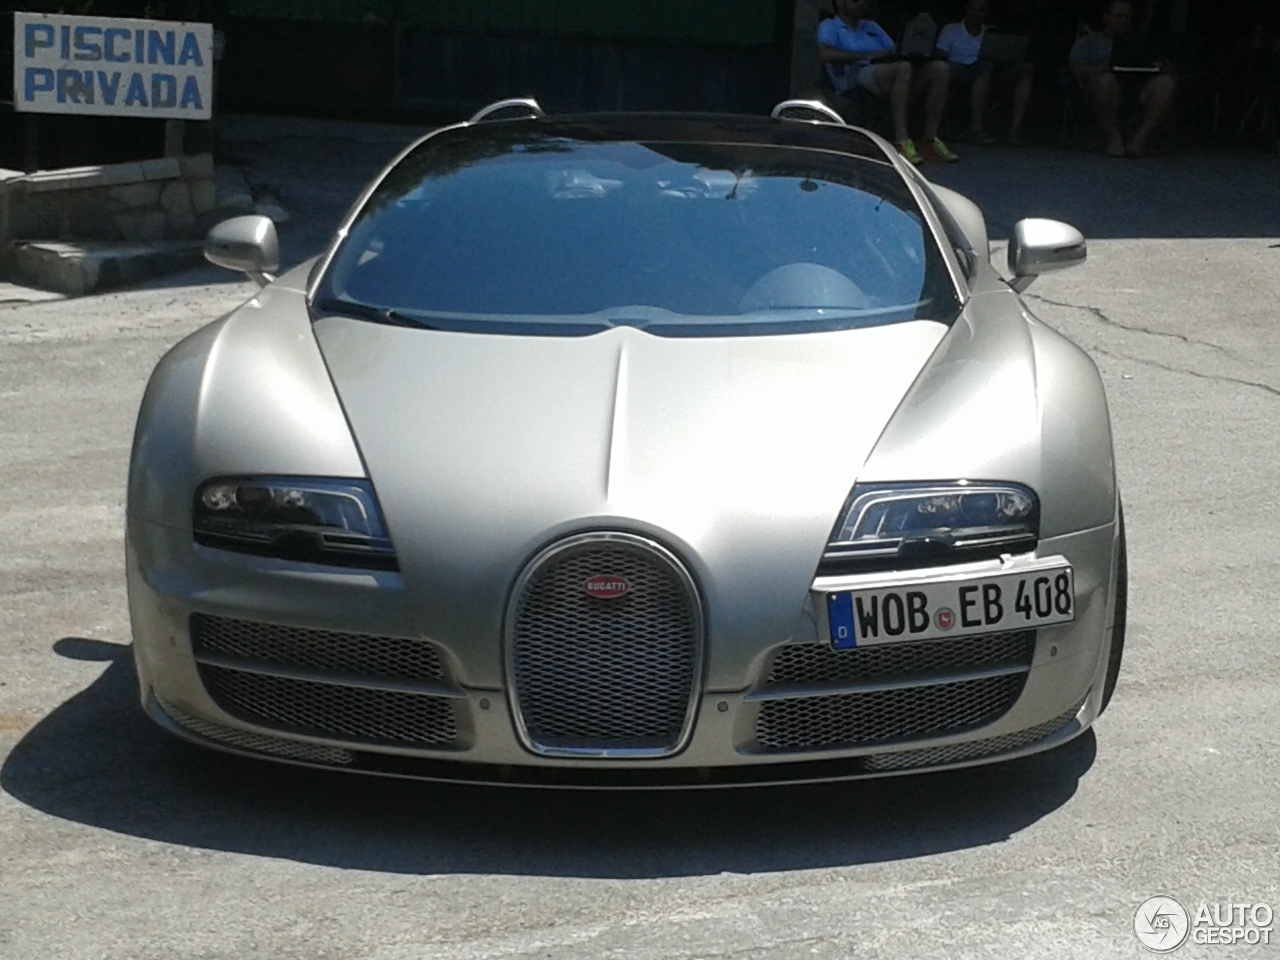 Bugatti Veyron 16.4 Super Sport - 30 August 2013 - Autogespot2013 Bugatti Veyron 16.4 Super Sport